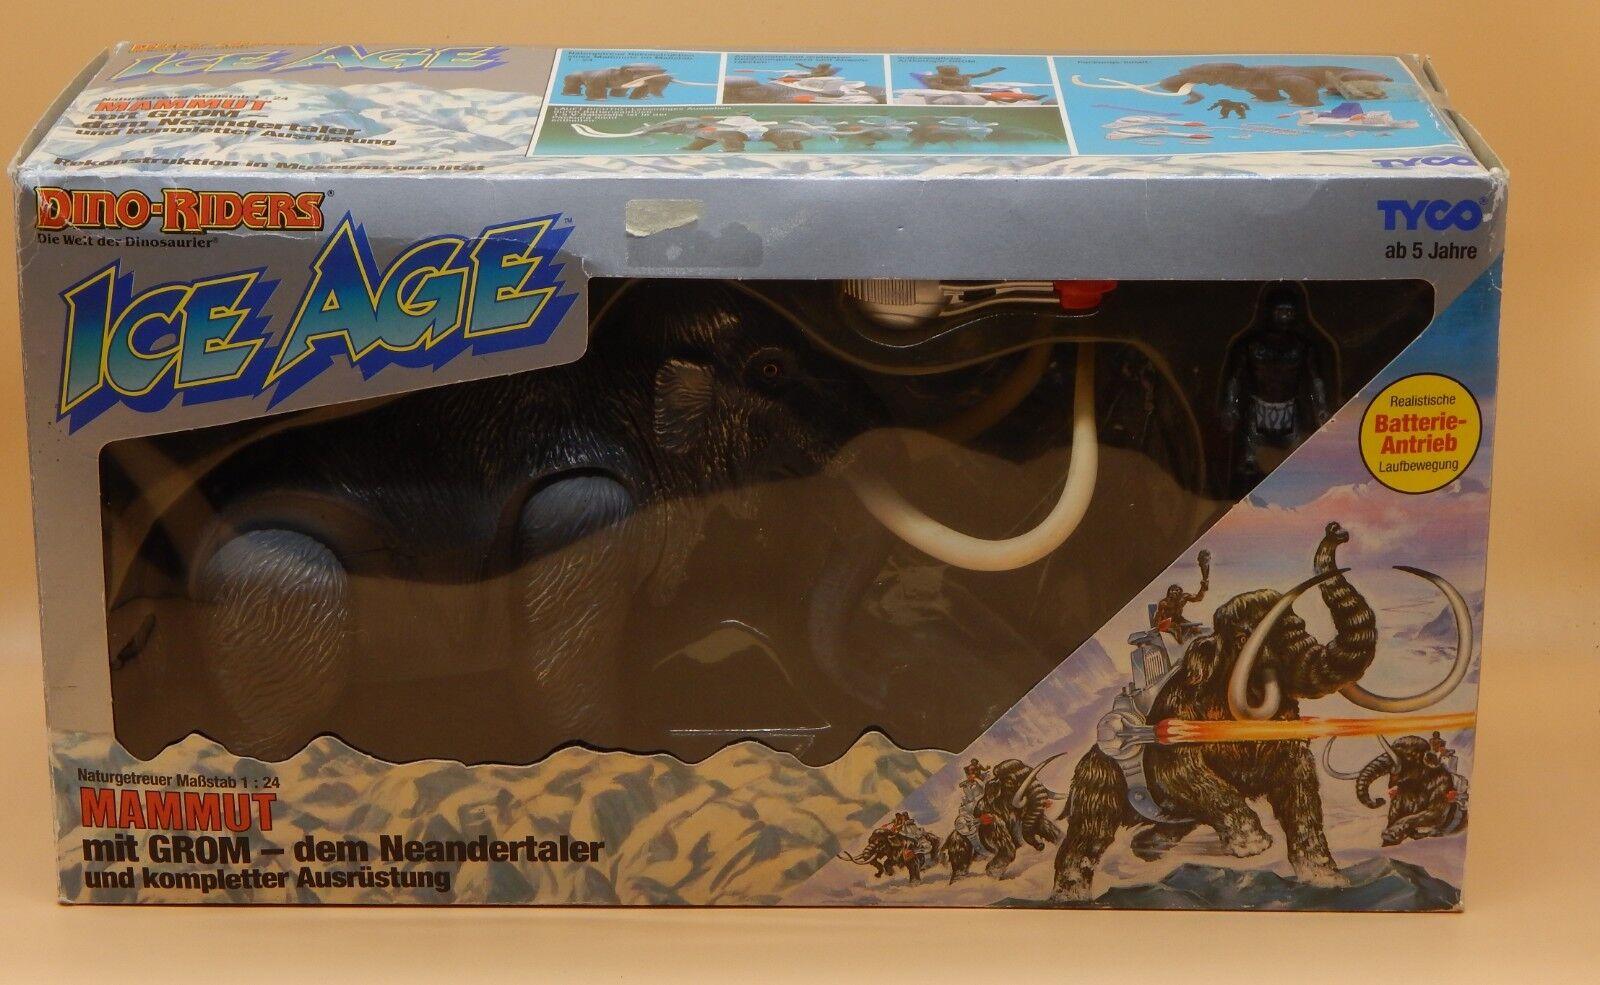 1989 vintage Tyco Dino Riders Ice Age  MAMMOTH w Grom cifra 100% completare in scatola  seleziona tra le nuove marche come